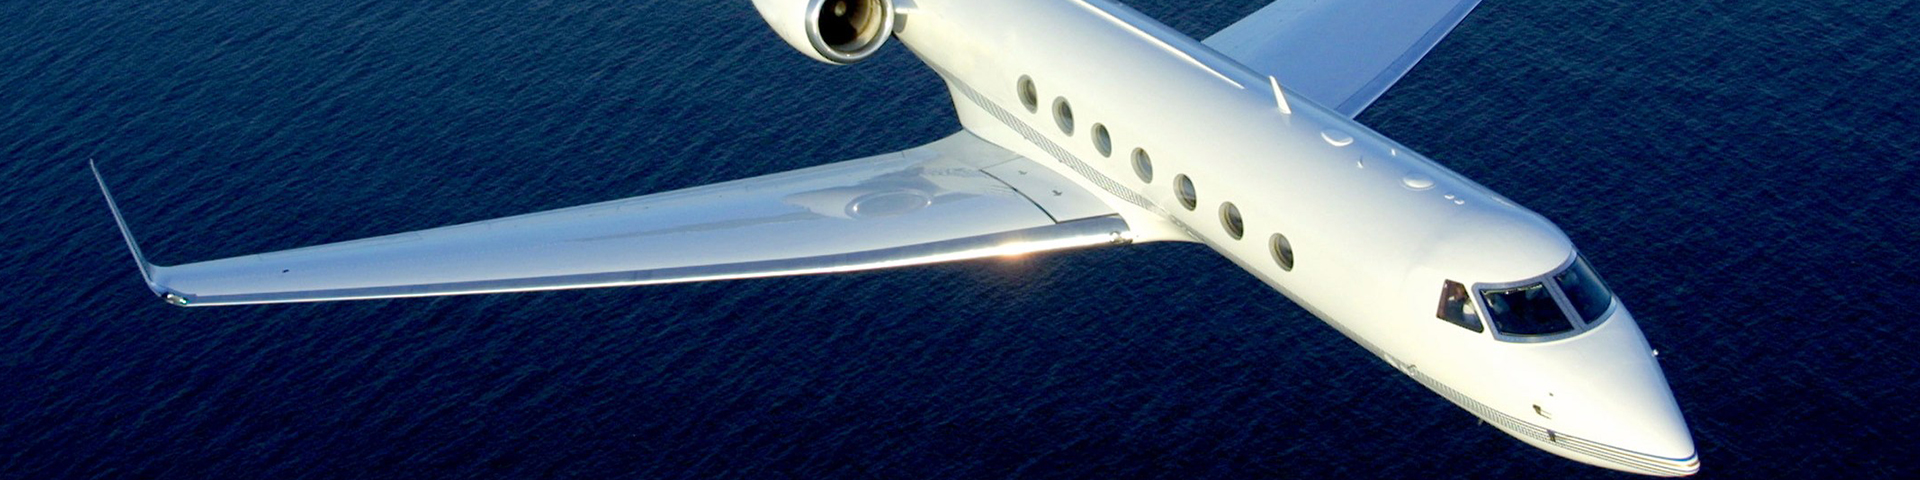 gulfstream v - Gulfstream V Private Jet